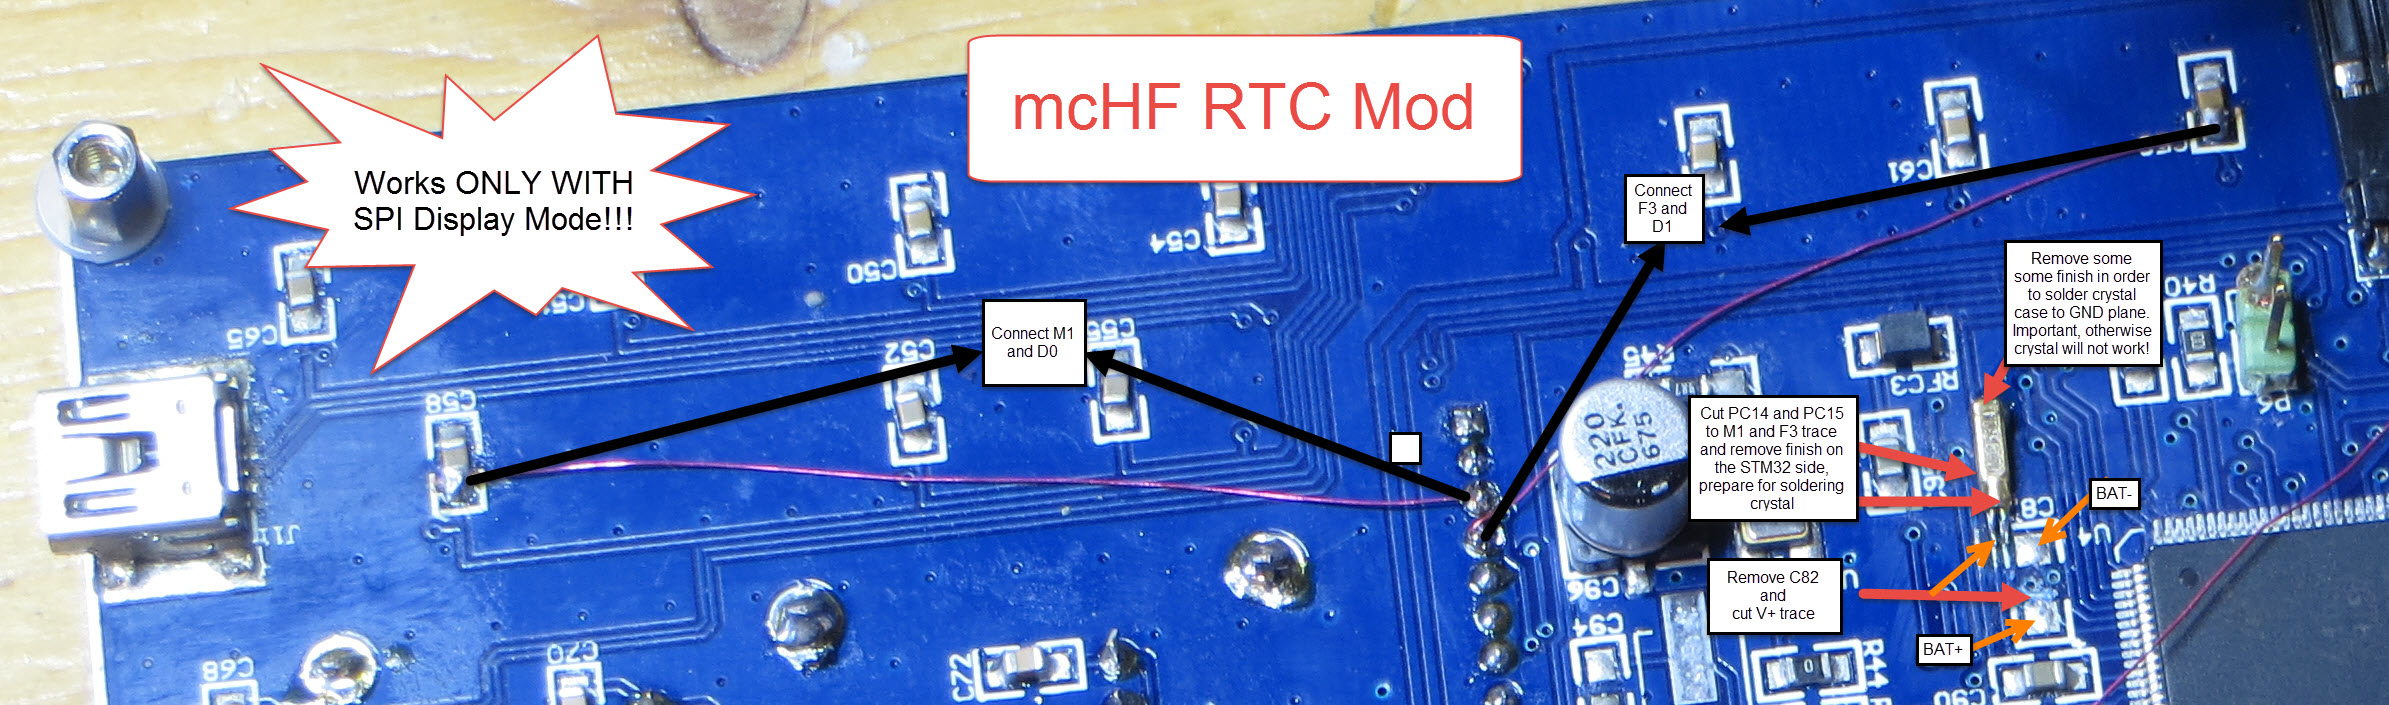 mchf RTC Mod